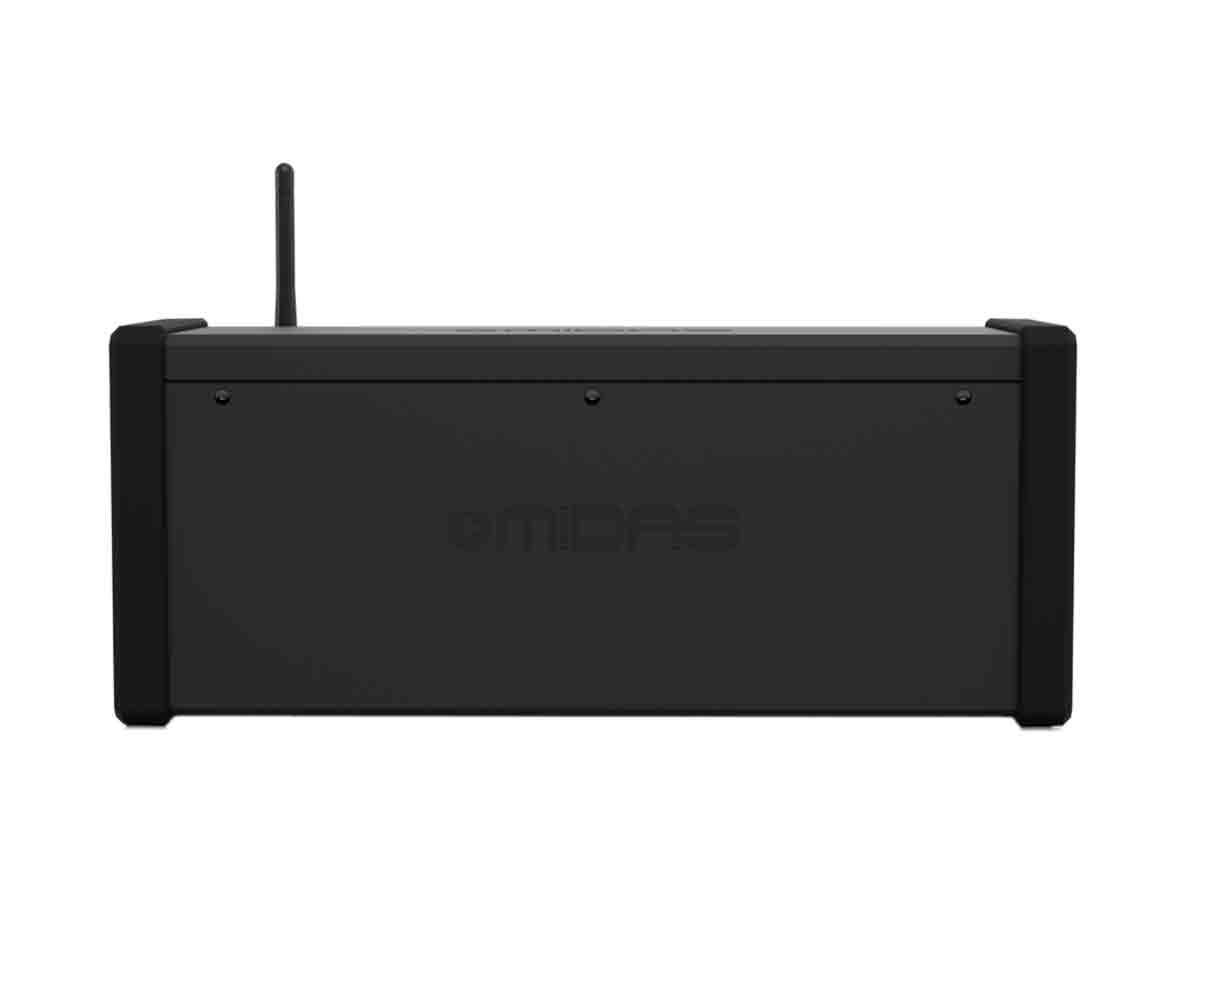 midas mr18 18 input digital mixer for ipad android tablets ebay. Black Bedroom Furniture Sets. Home Design Ideas